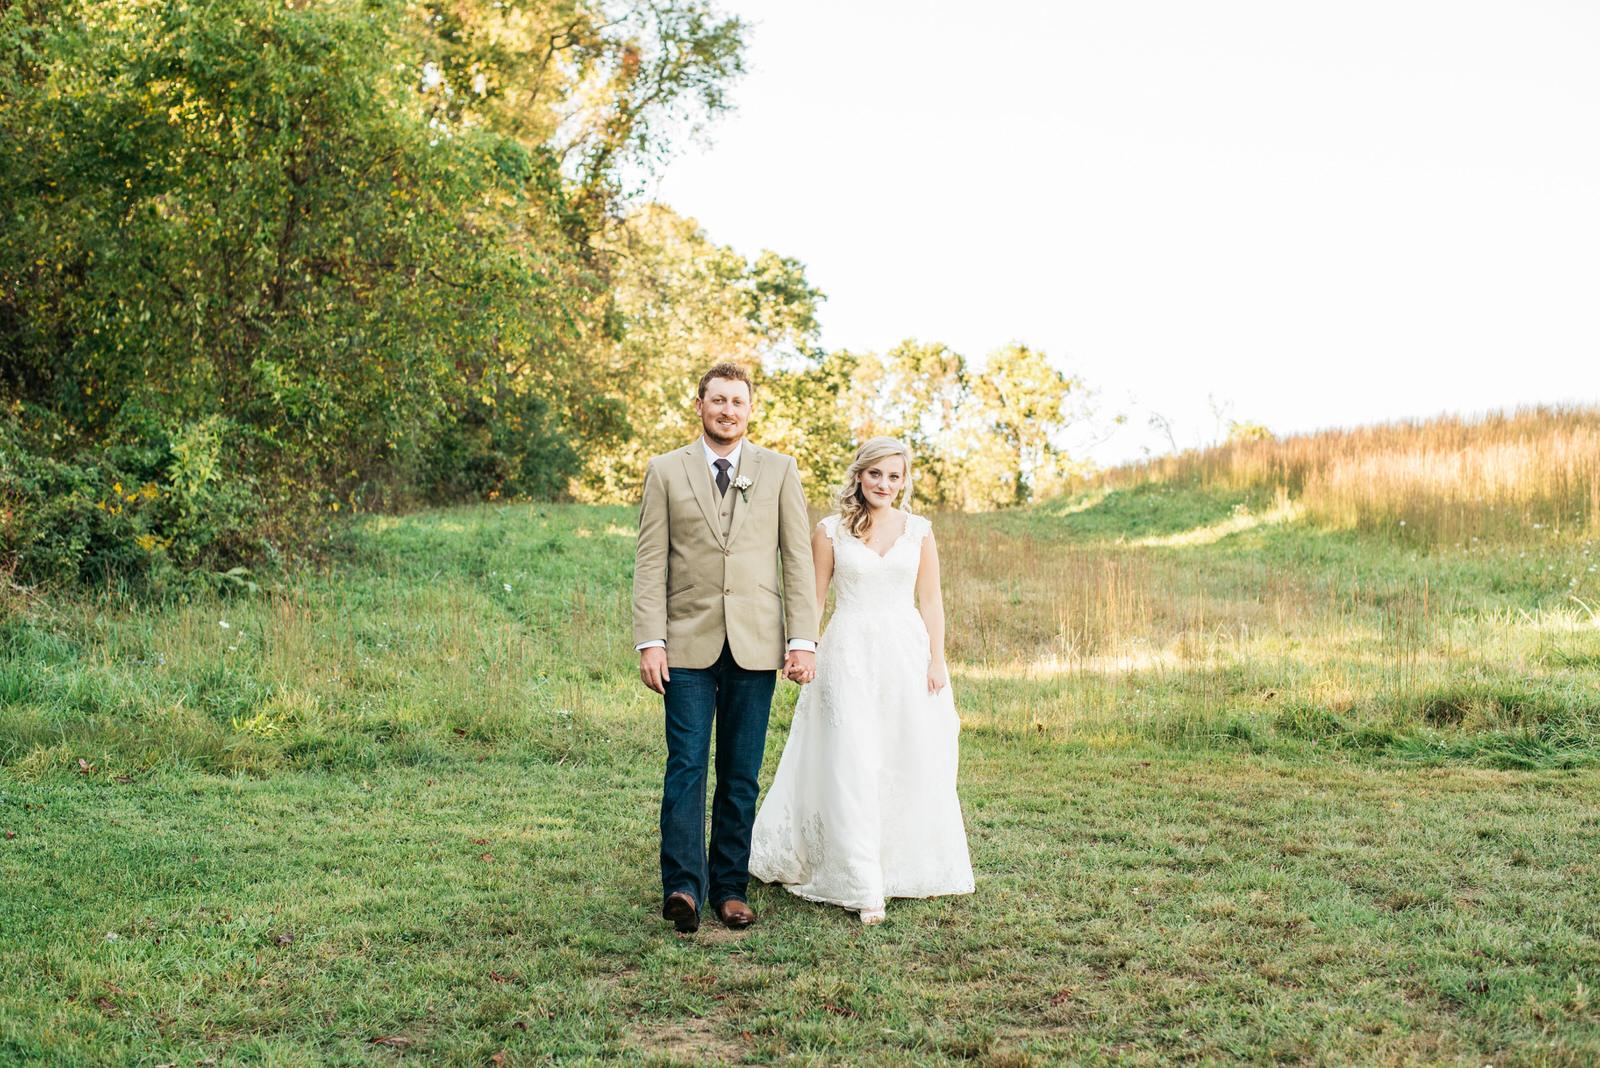 wedding_at_red_fox_winery_wedding_photographer073.jpg